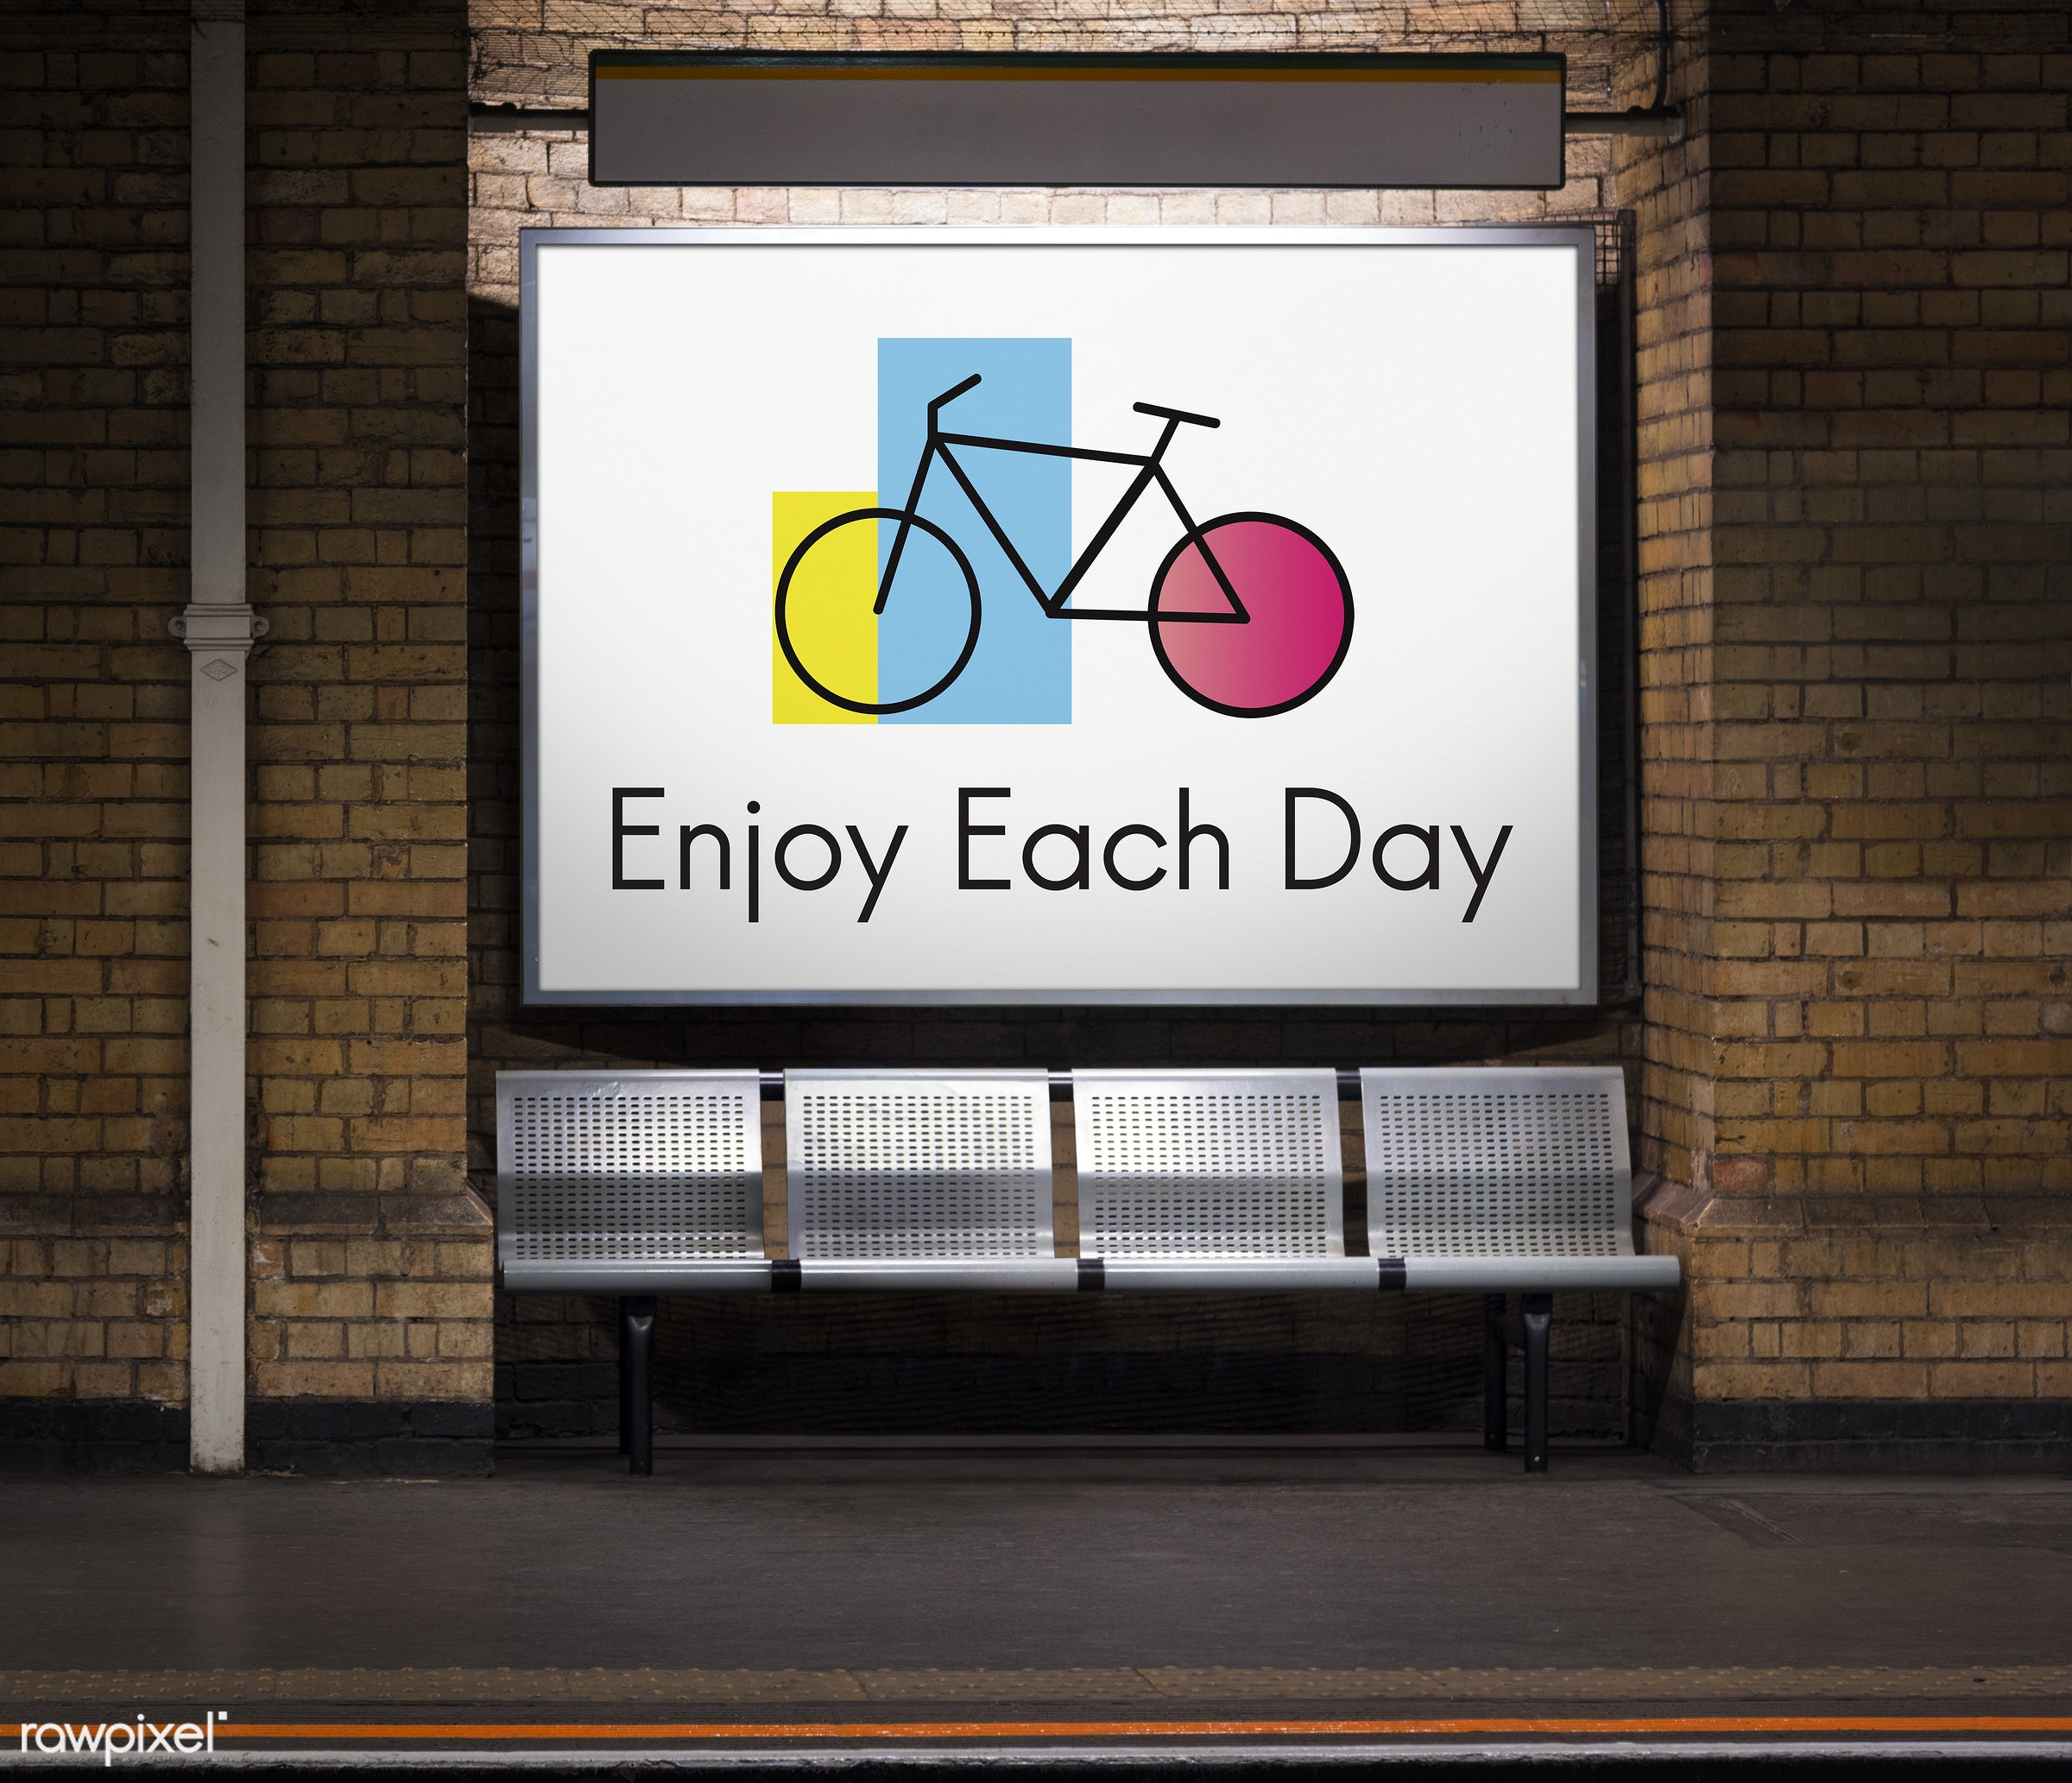 activity, bike, bricks, brickswall, city living, cycle, enjoy each day, enjoy life, enjoyment, excercise, freedom, happiness...